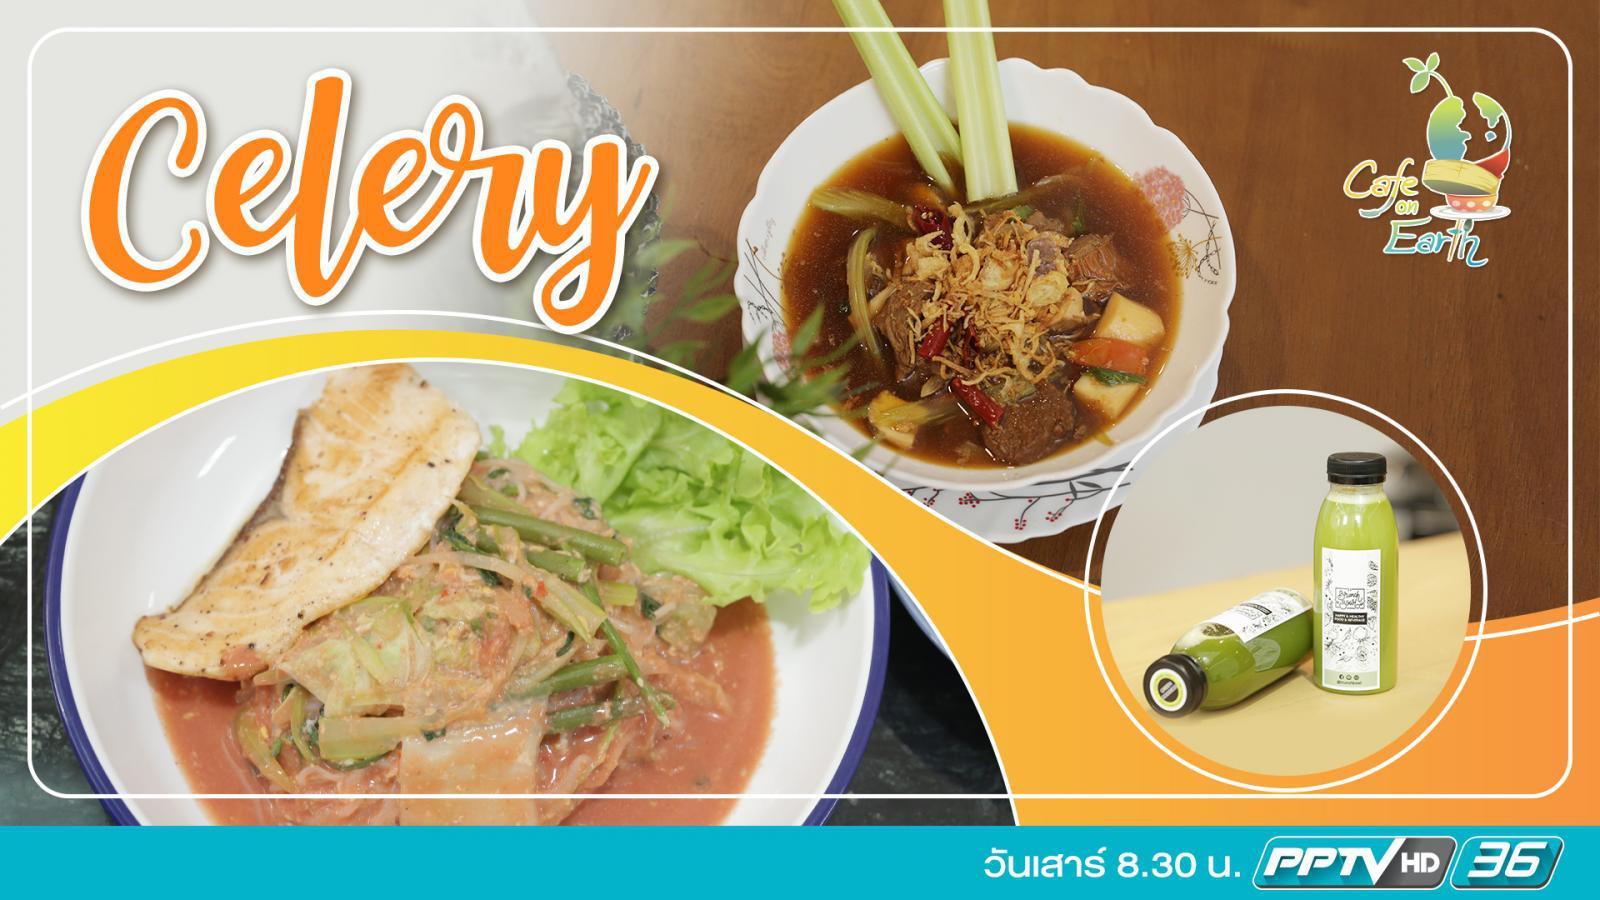 Celery - ขึ้นฉ่ายสารพัดเมนูสุขภาพ